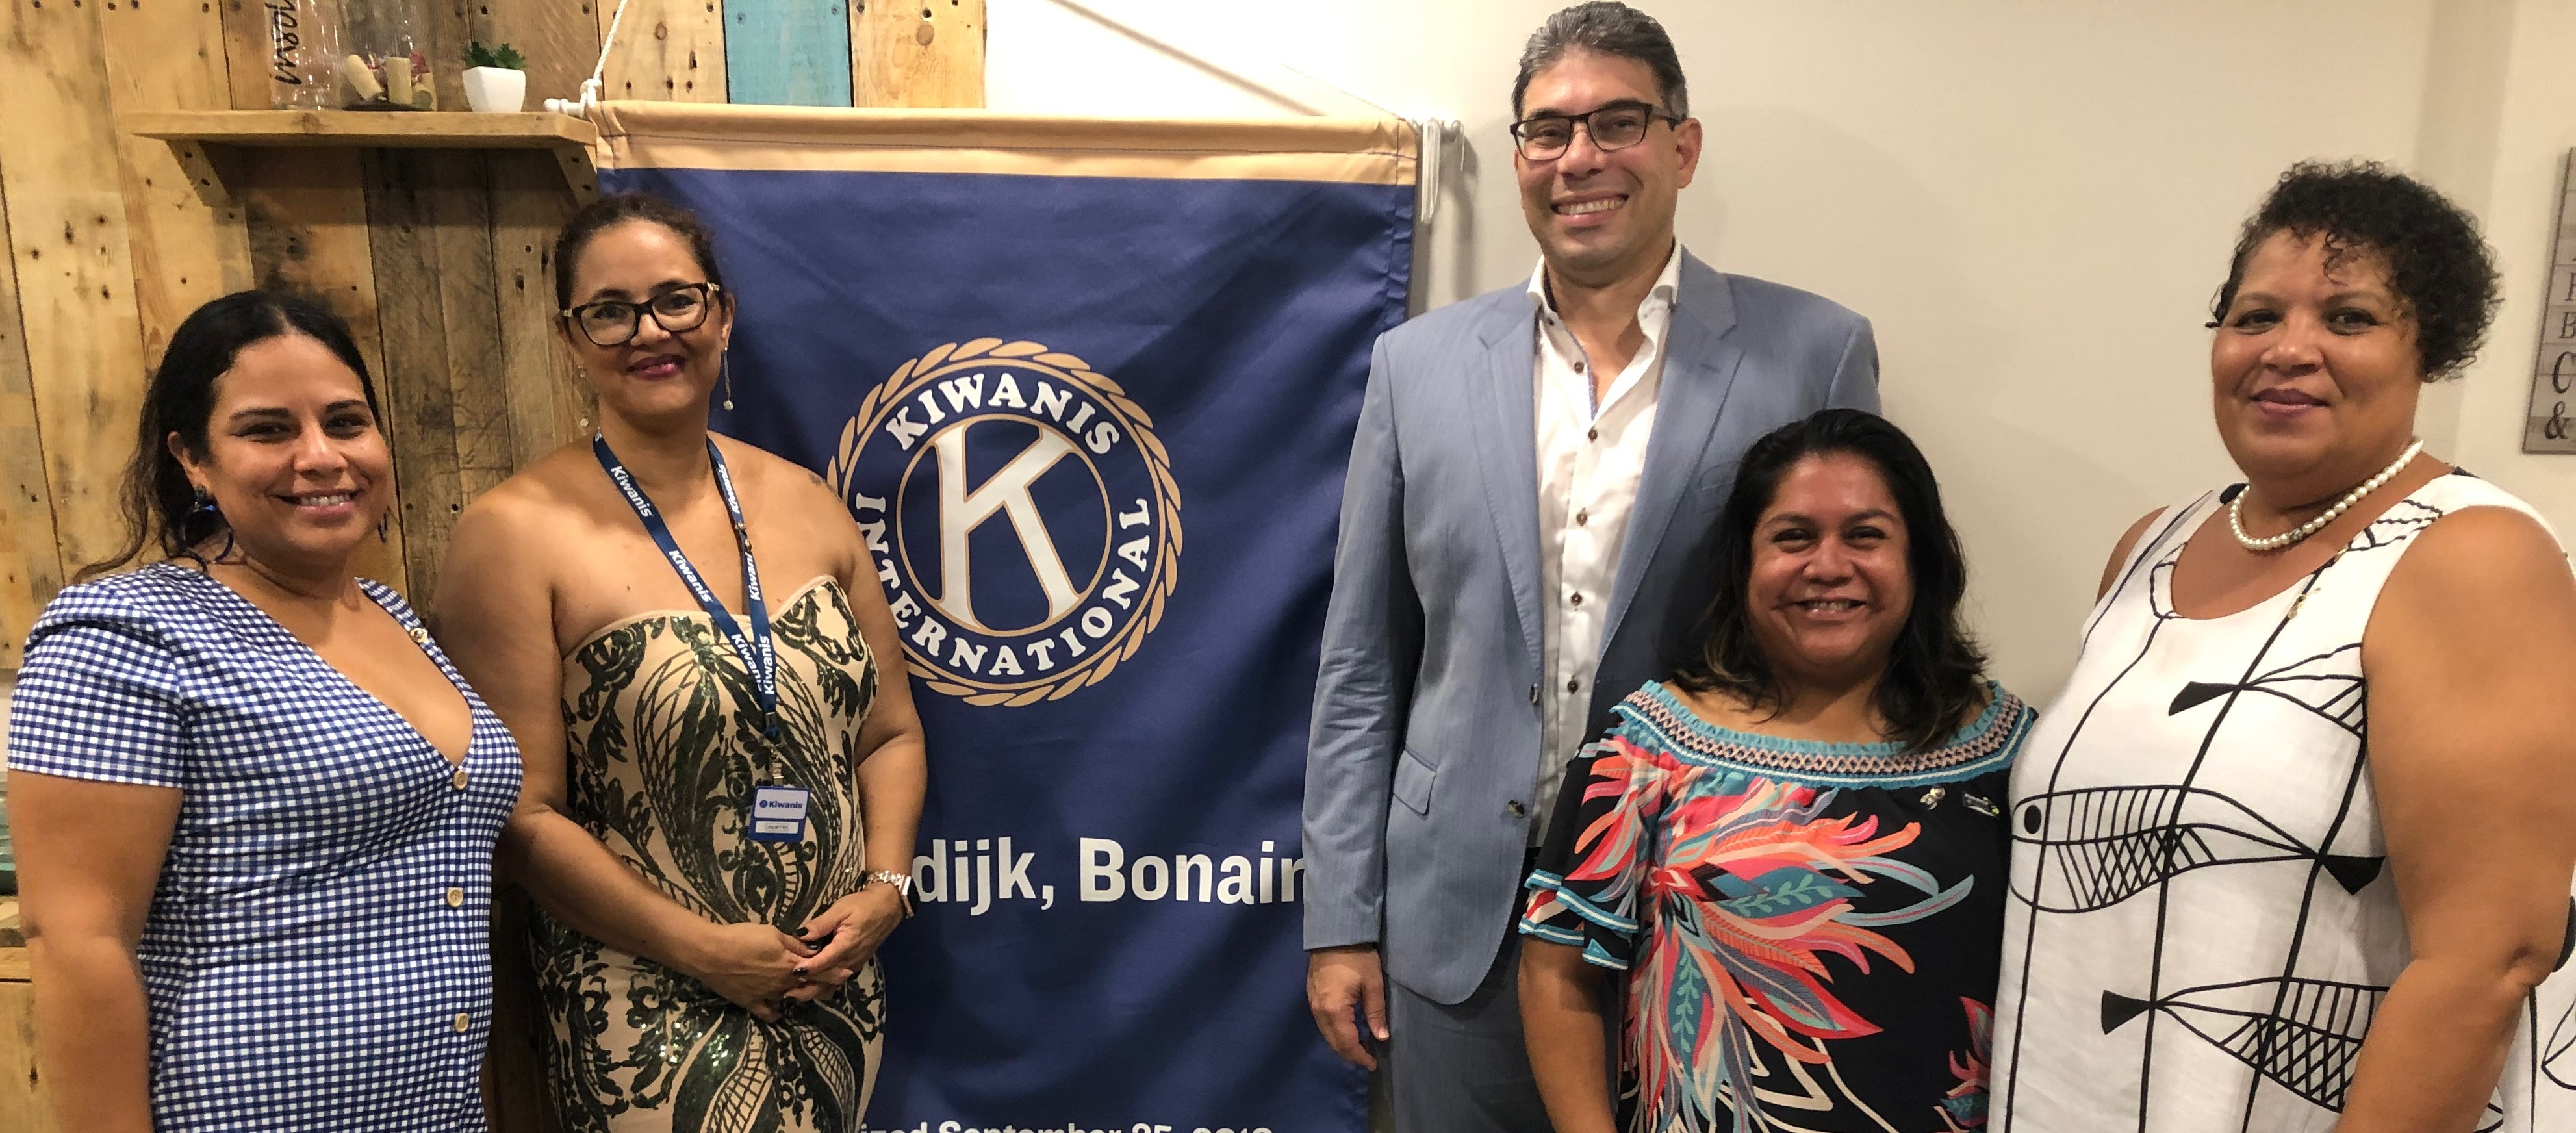 KIWANIS CLUB OF KRALENDIJK BONAIRE TA ANUNSIÁ DIREKTIVA NOBO PA 2019-2020